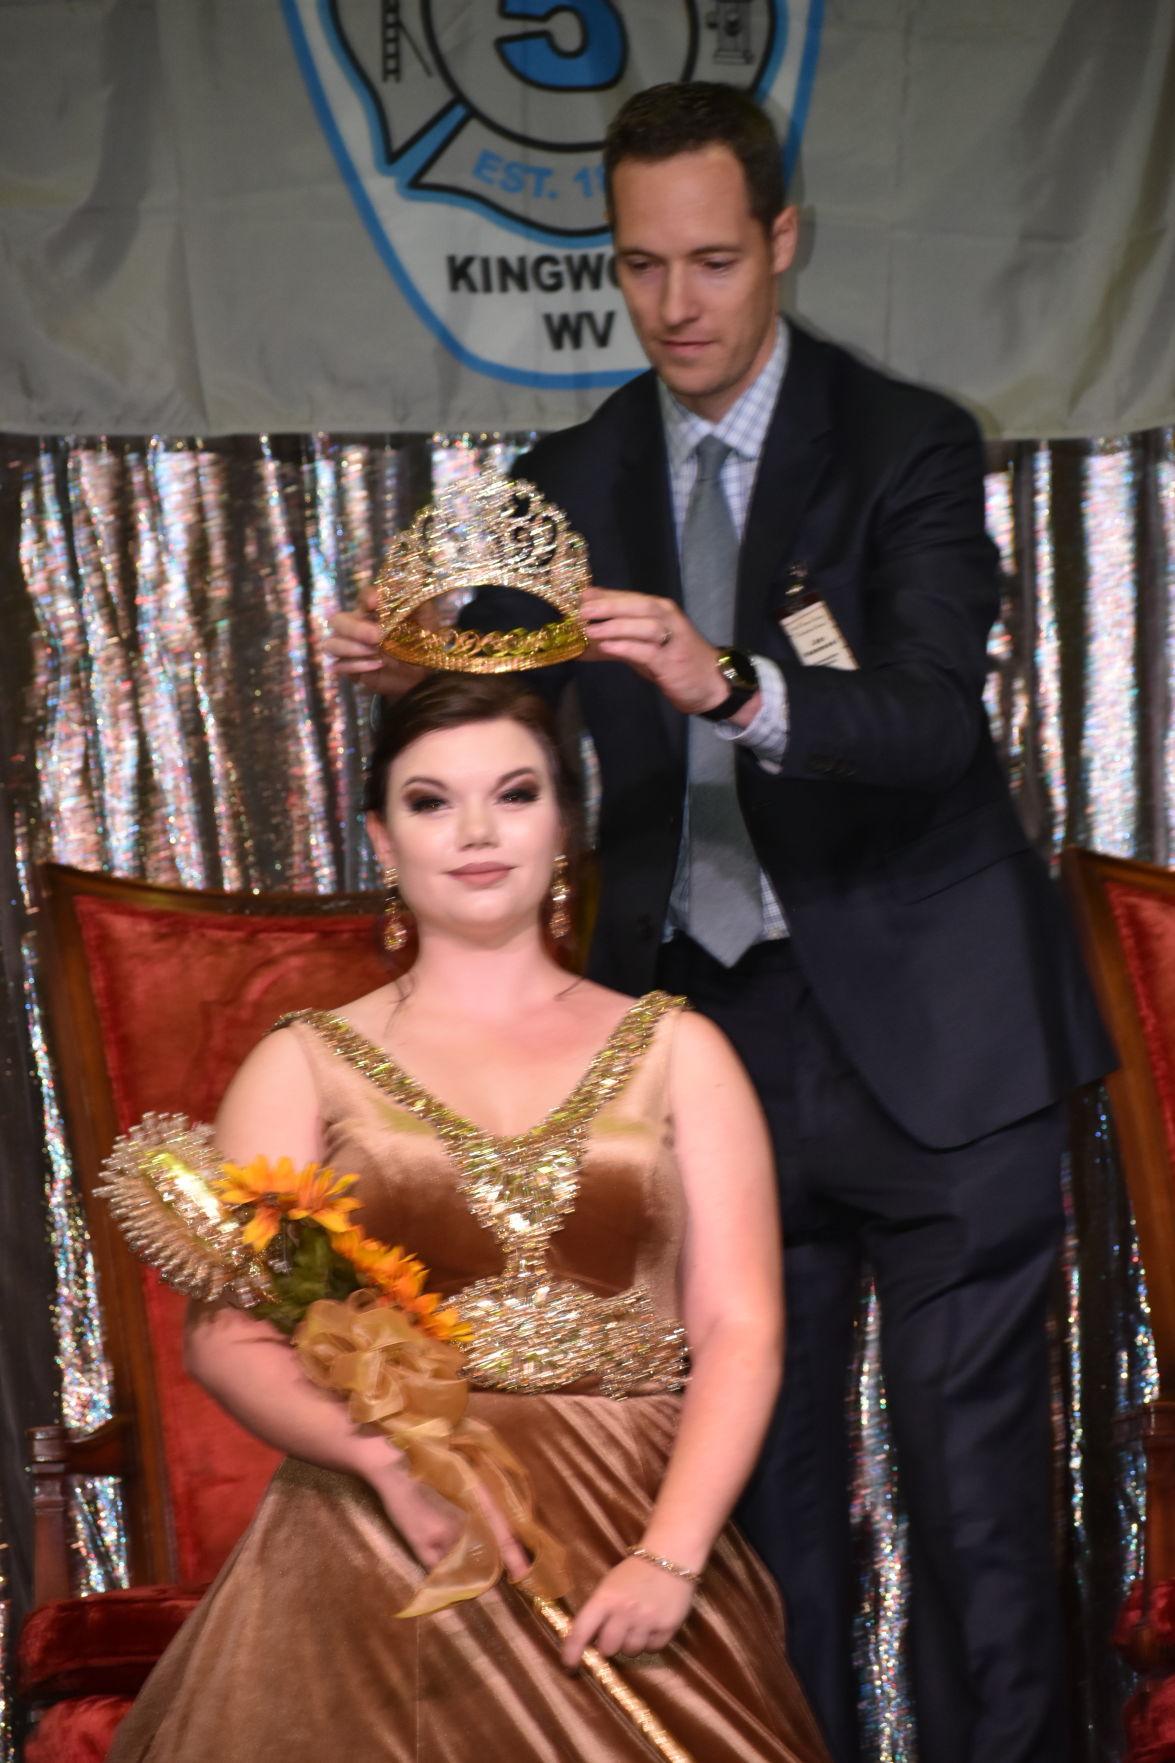 Queen Ceres crowning